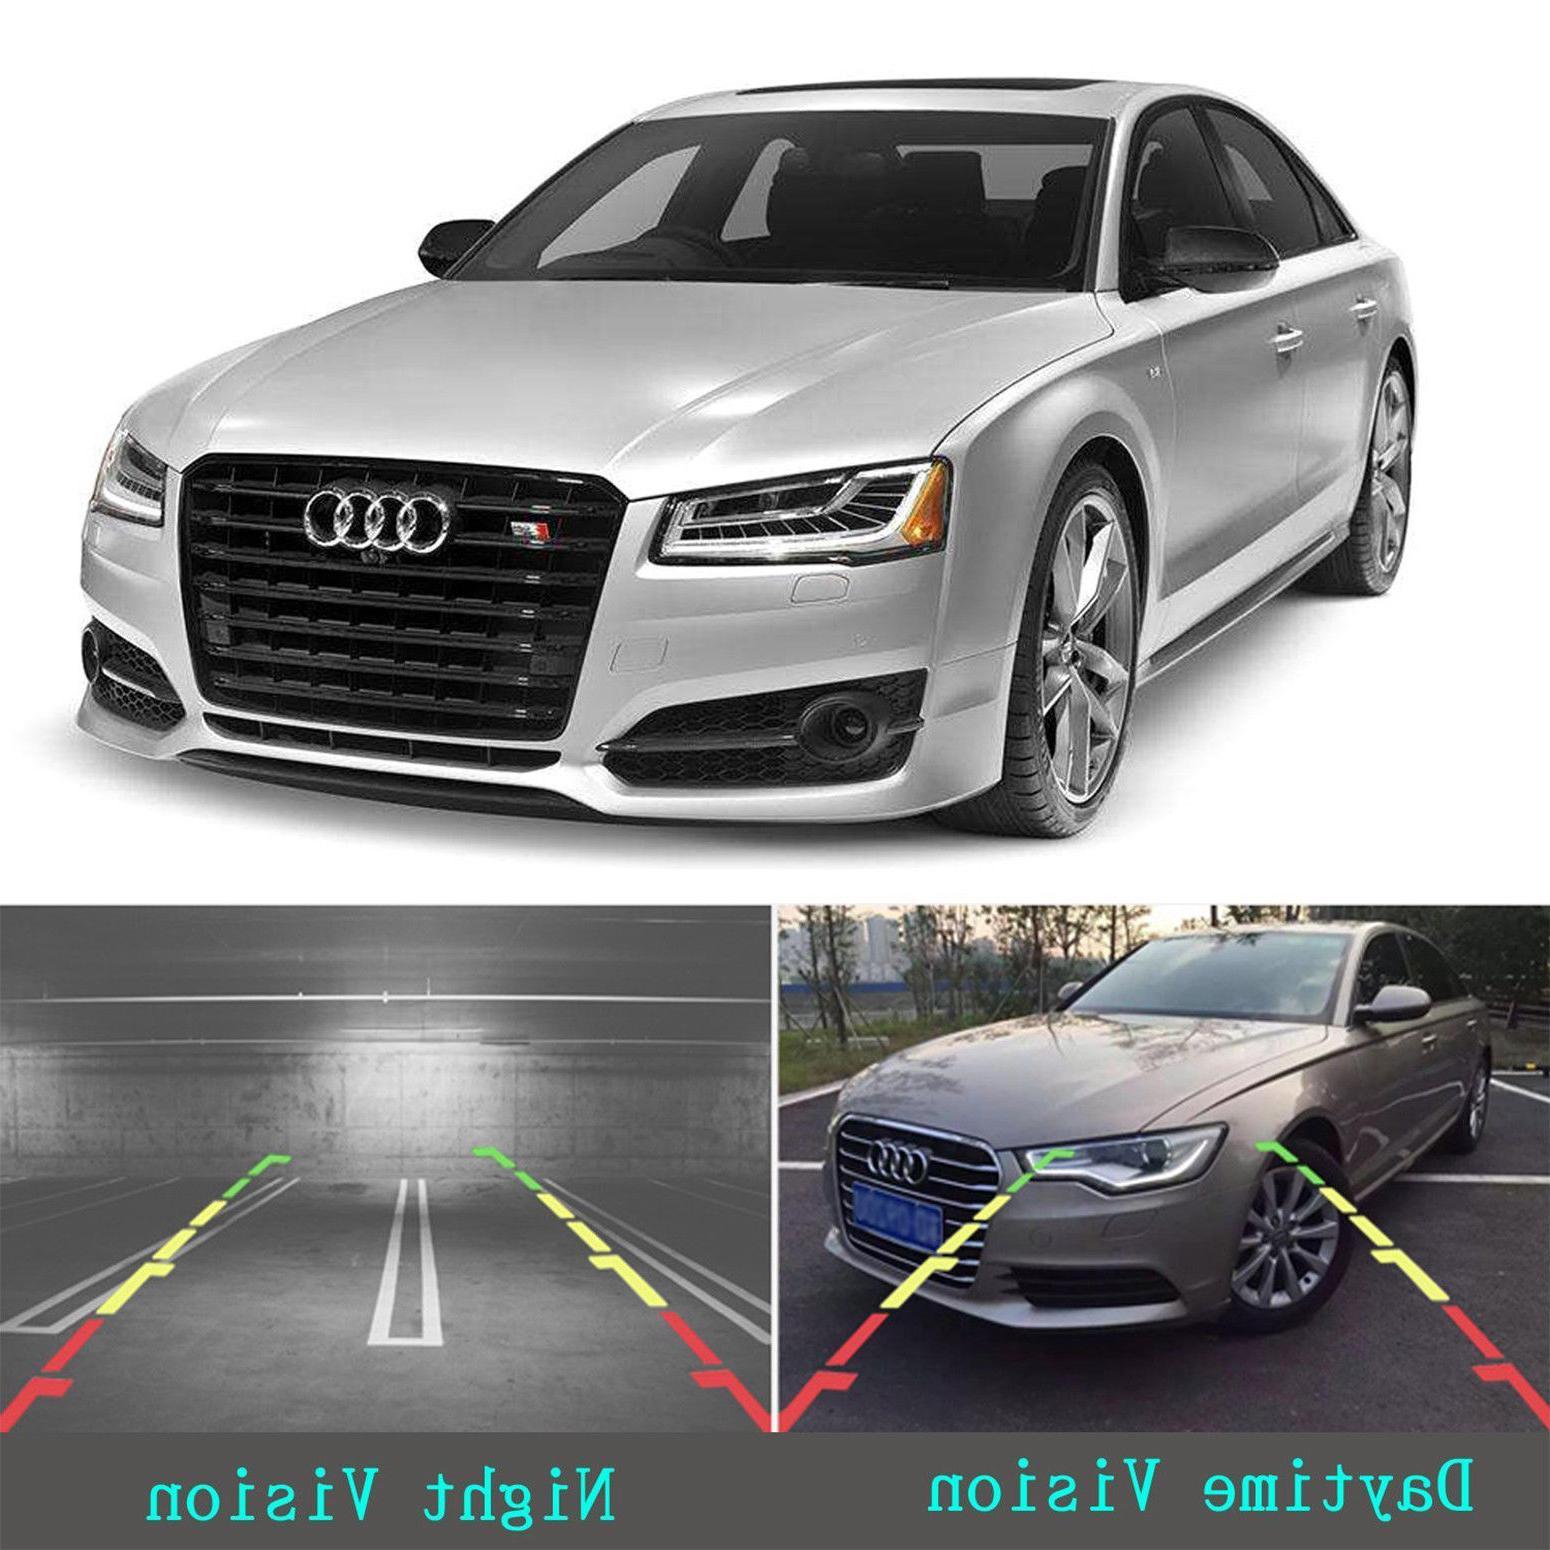 "Universal Camera System w/ LCD 4.3"" Car Rear"